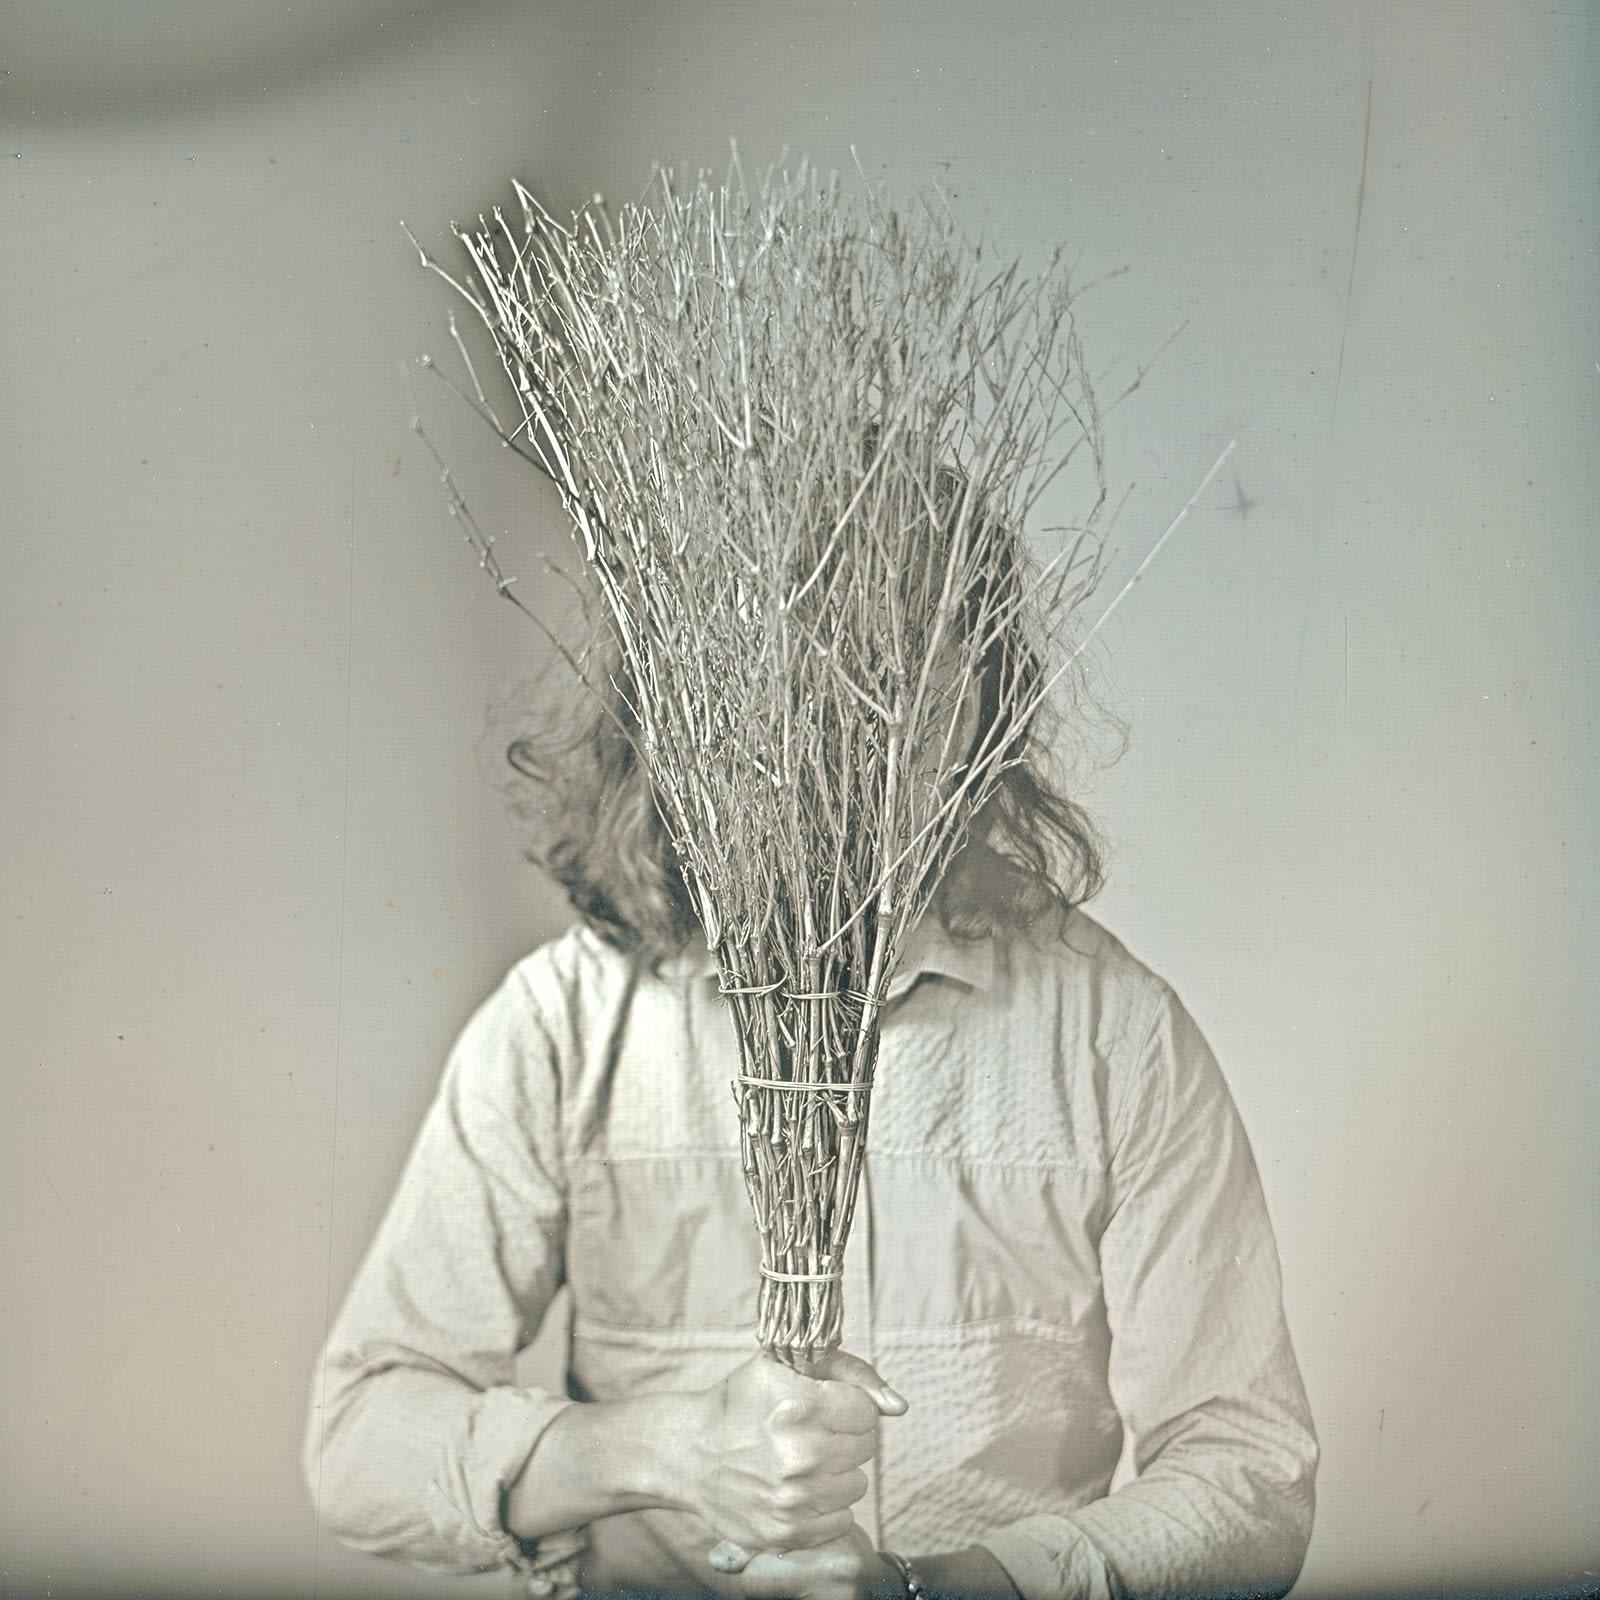 Takashi Arai, Self with Besom, 2020